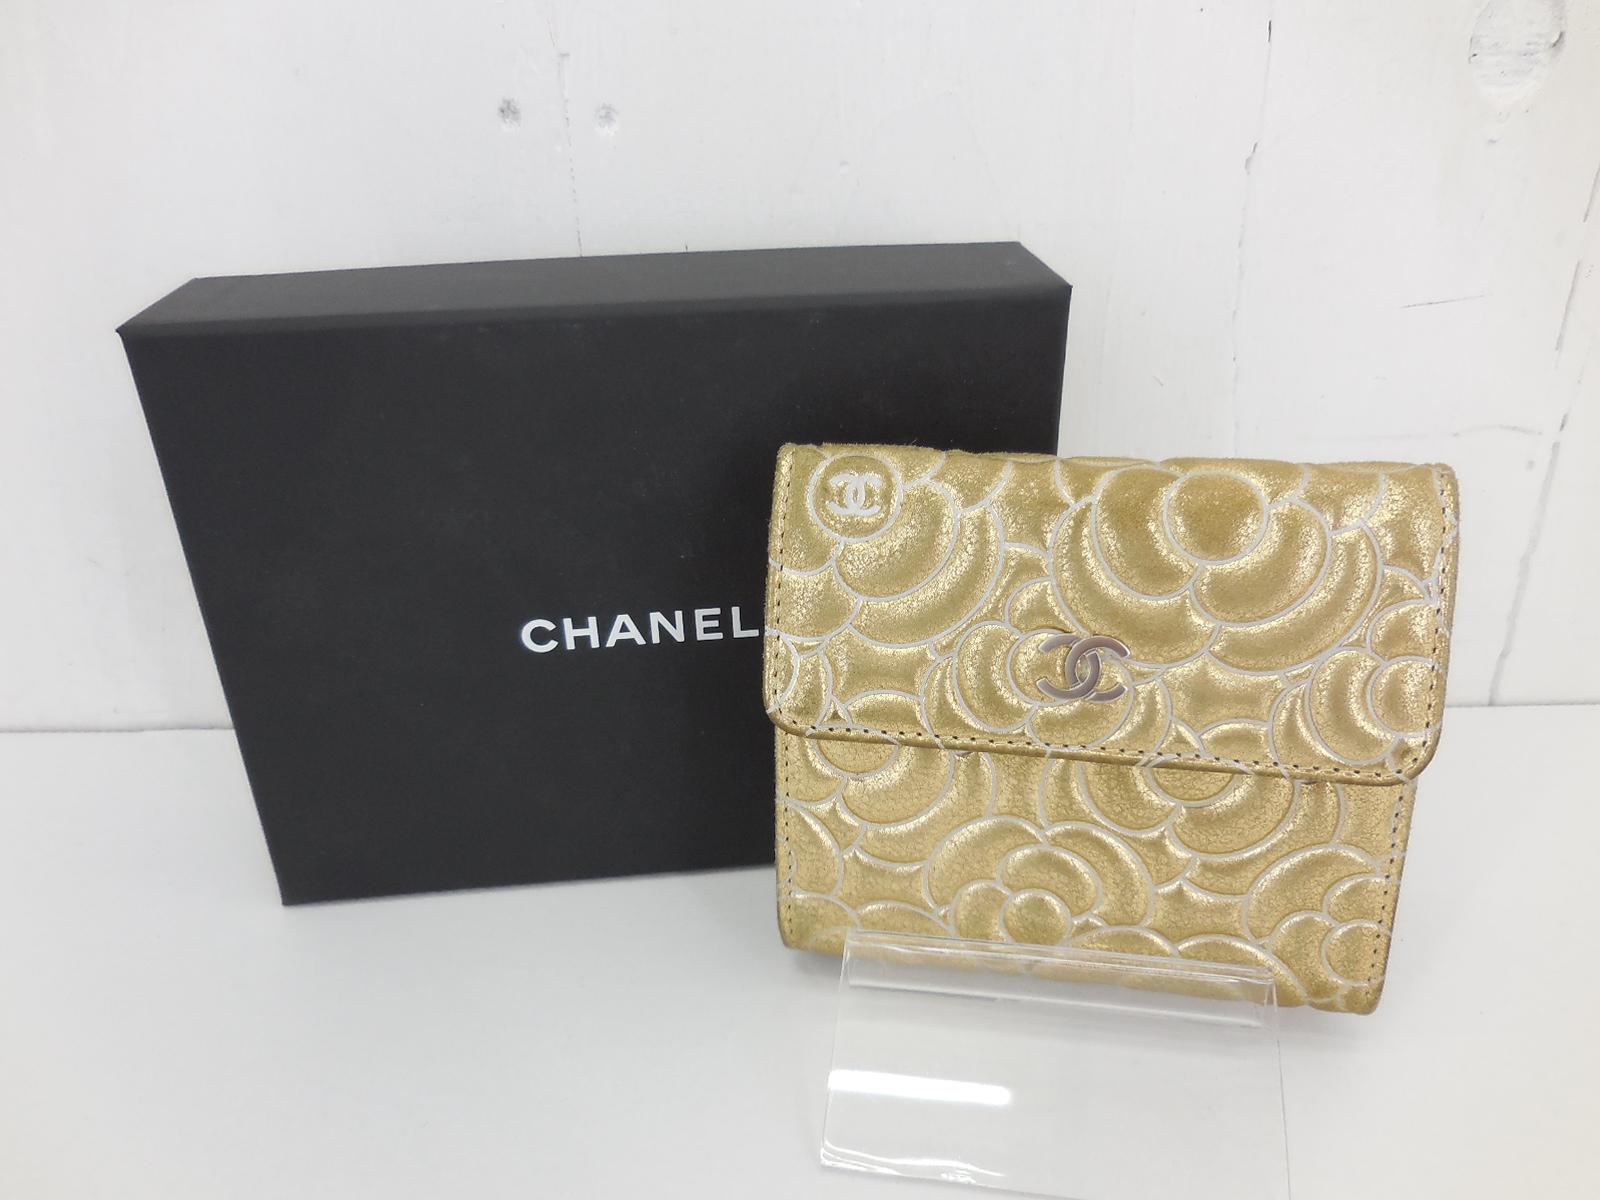 CHANEL A82294 Wホック 2つ折り 財布 シャネル ウォレット カメリアゴールド JSB鑑定済み